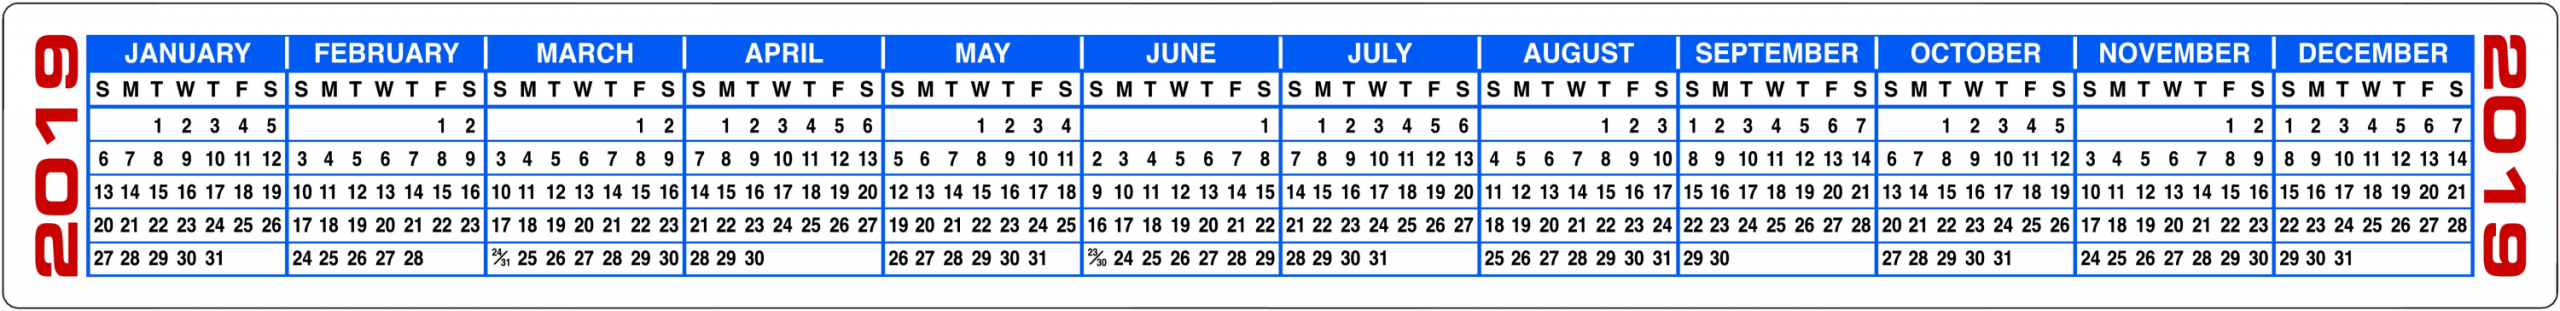 Free Printable 2020 Calendars & 2020 Calendar Strips